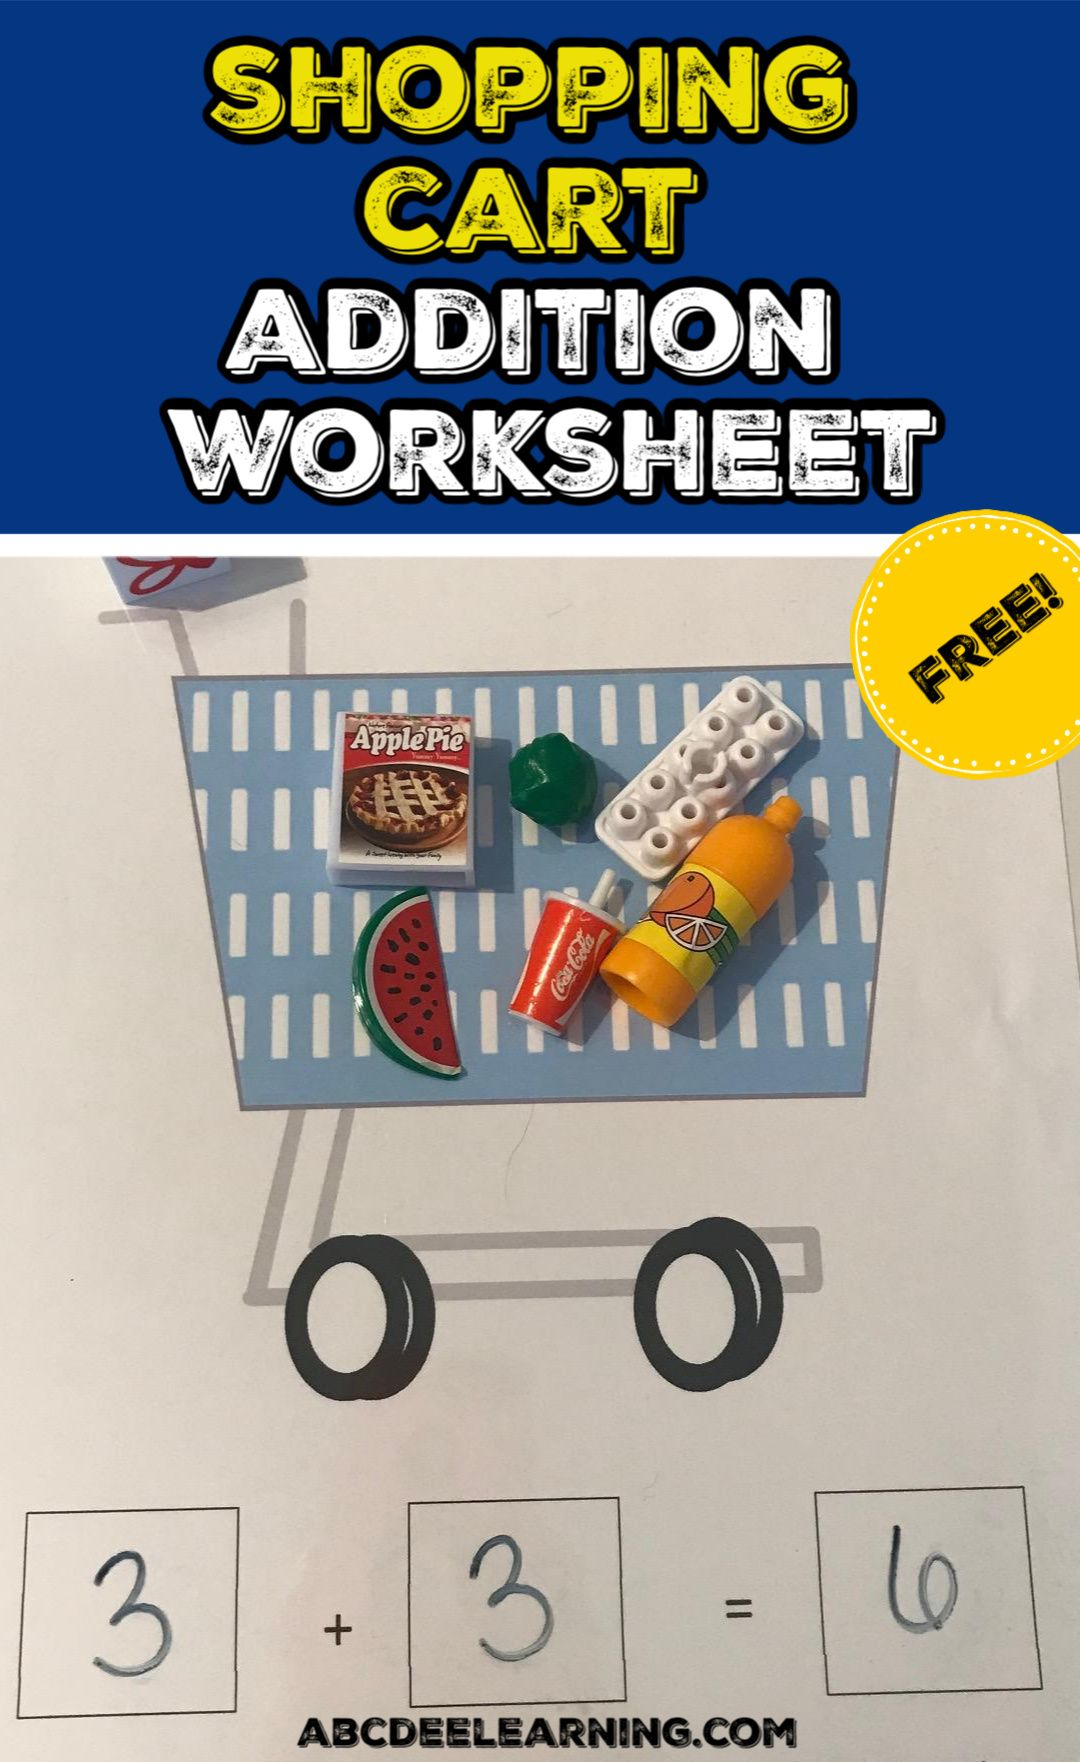 Shopping Cart Addition Worksheet Addition Activities Kindergarten Activities Addition Worksheets [ 1762 x 1080 Pixel ]